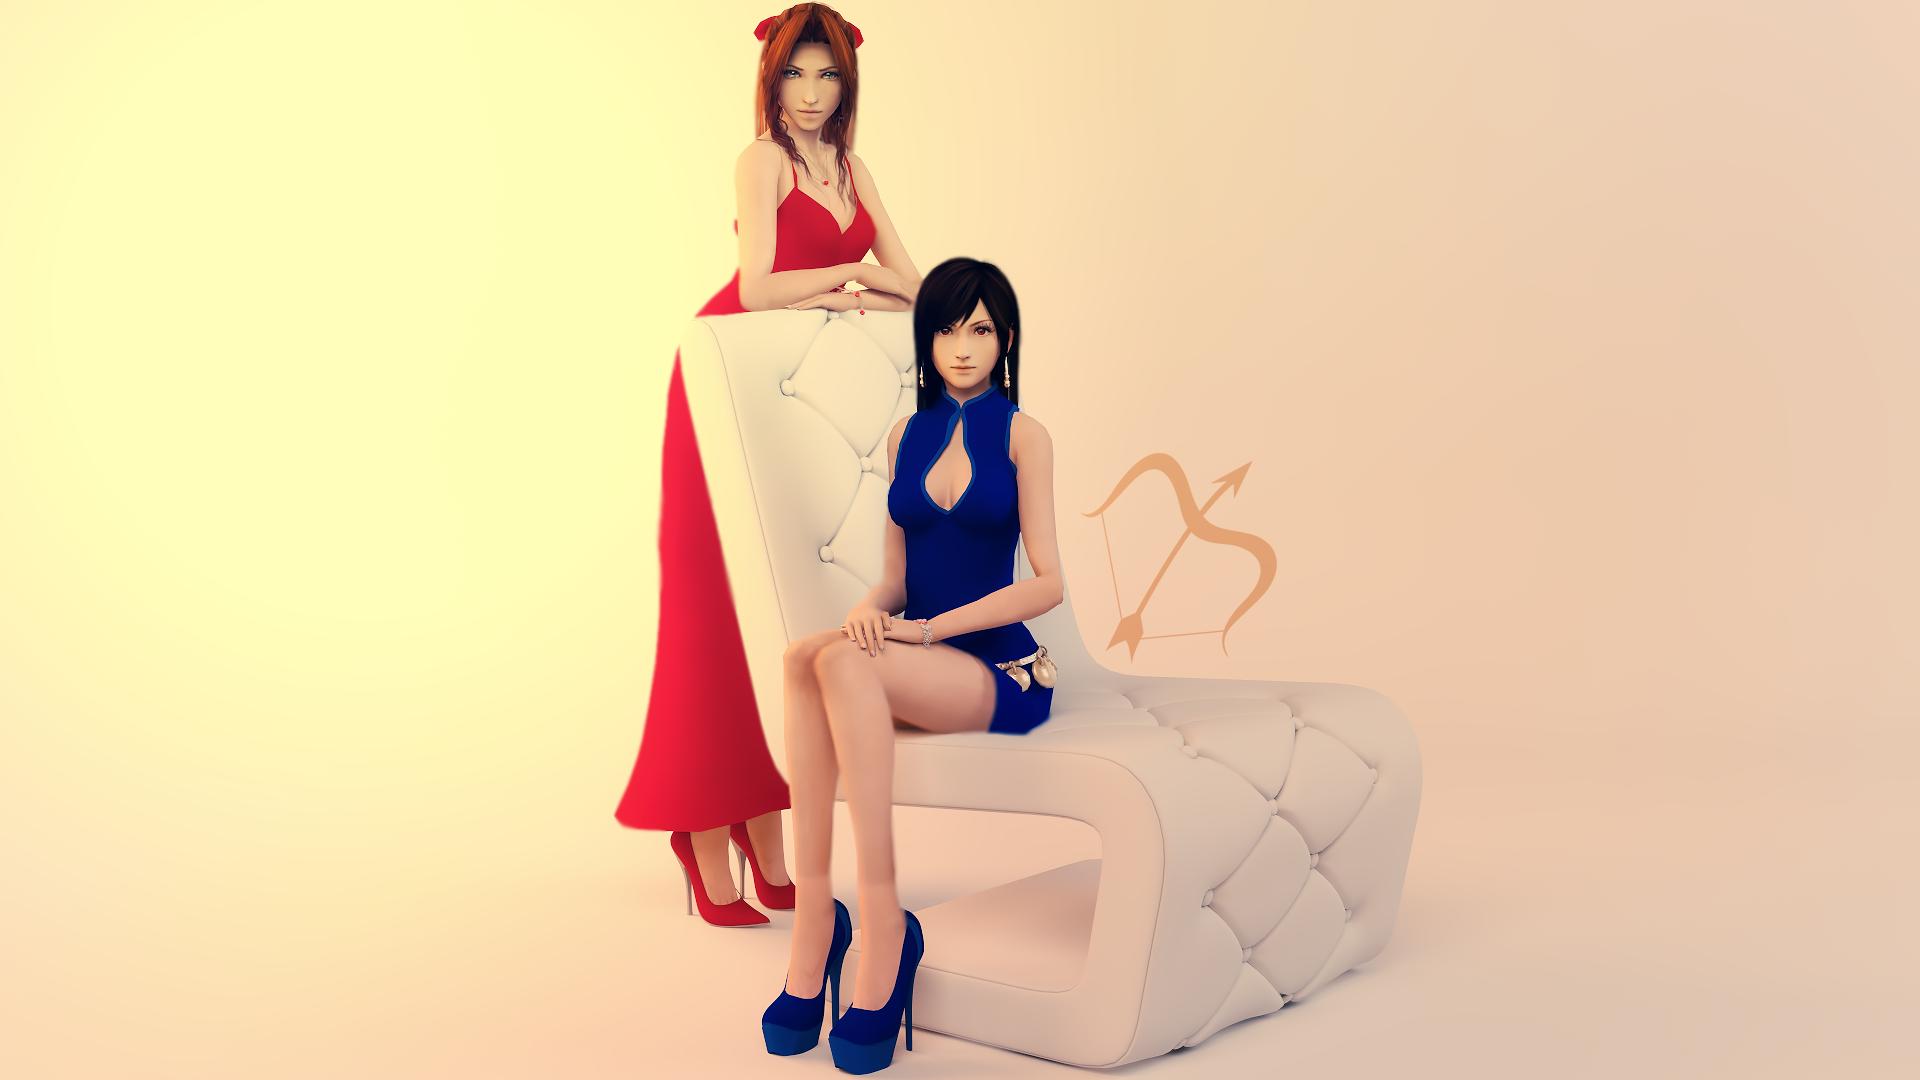 Chair Girls by Sreliata